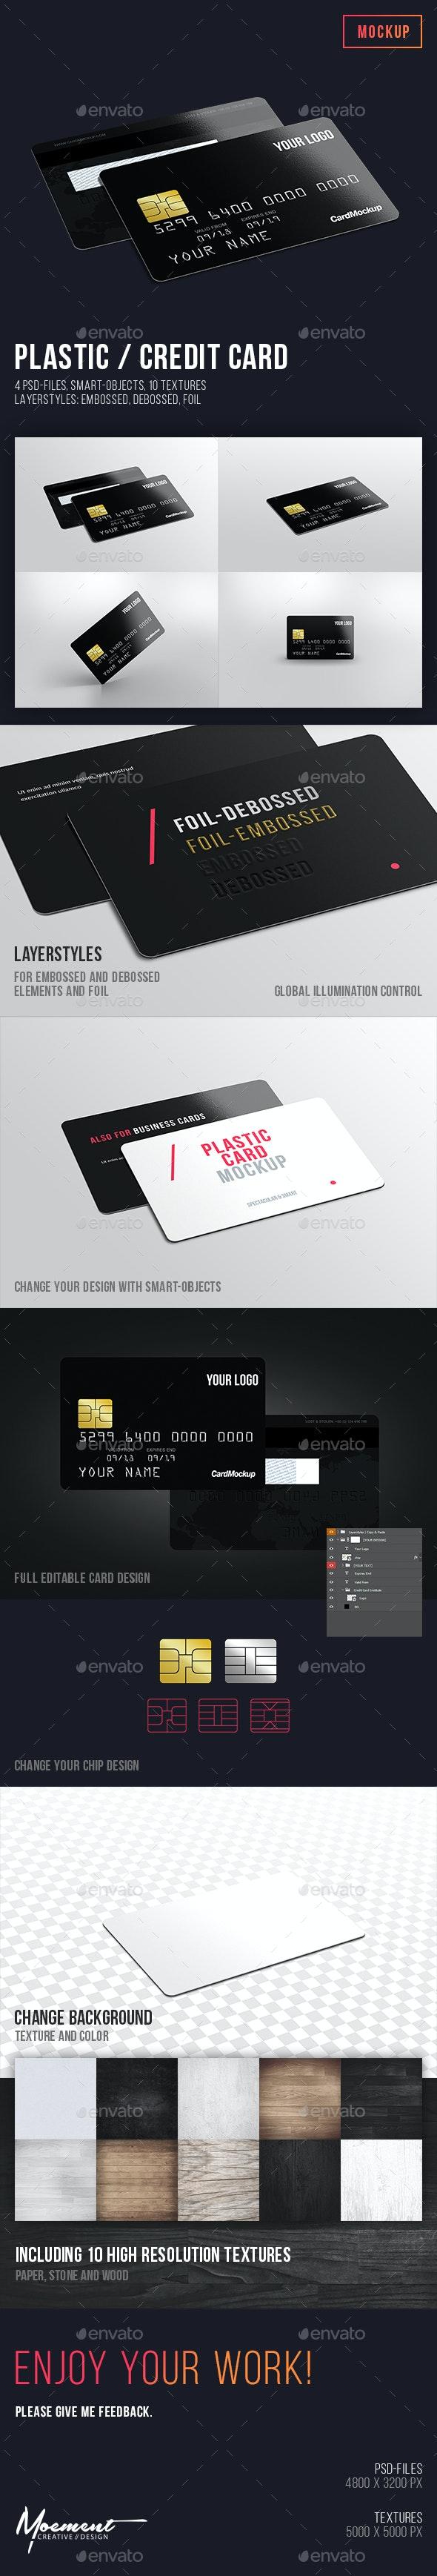 Plastic / Credit Card Mockup